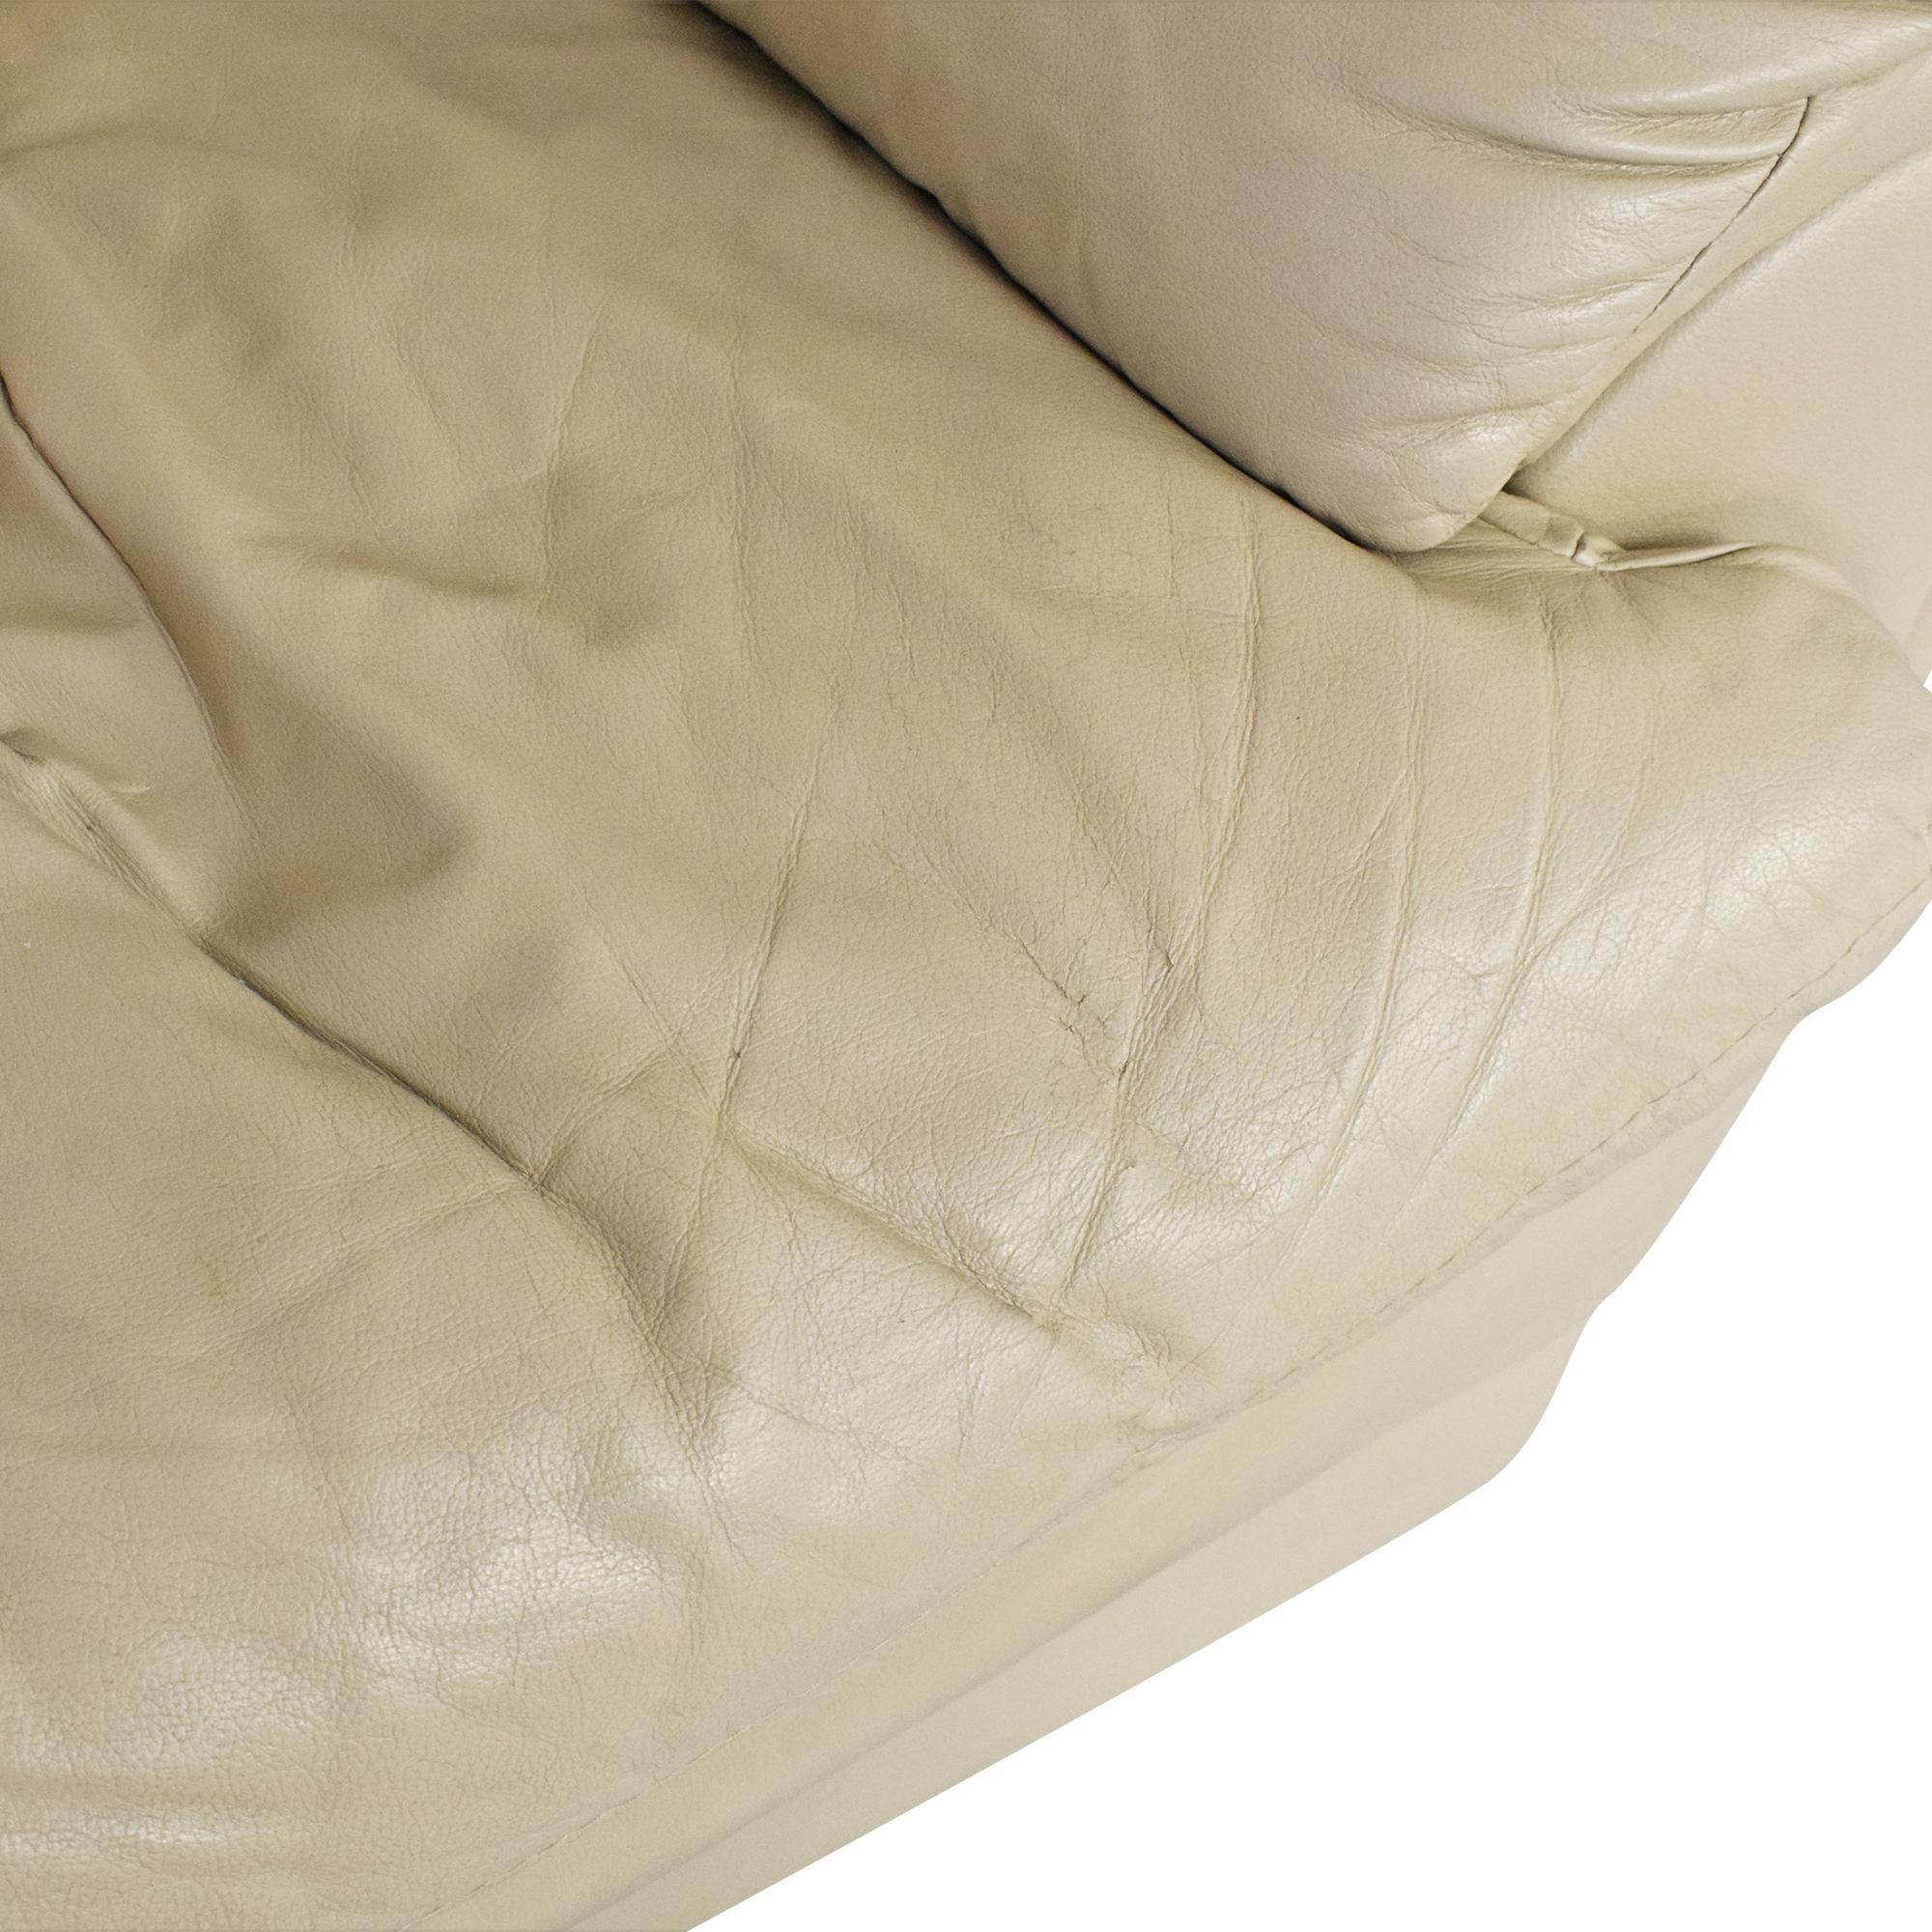 Raymour & Flanigan Raymour & Flanigan Padded Arm Chair dimensions